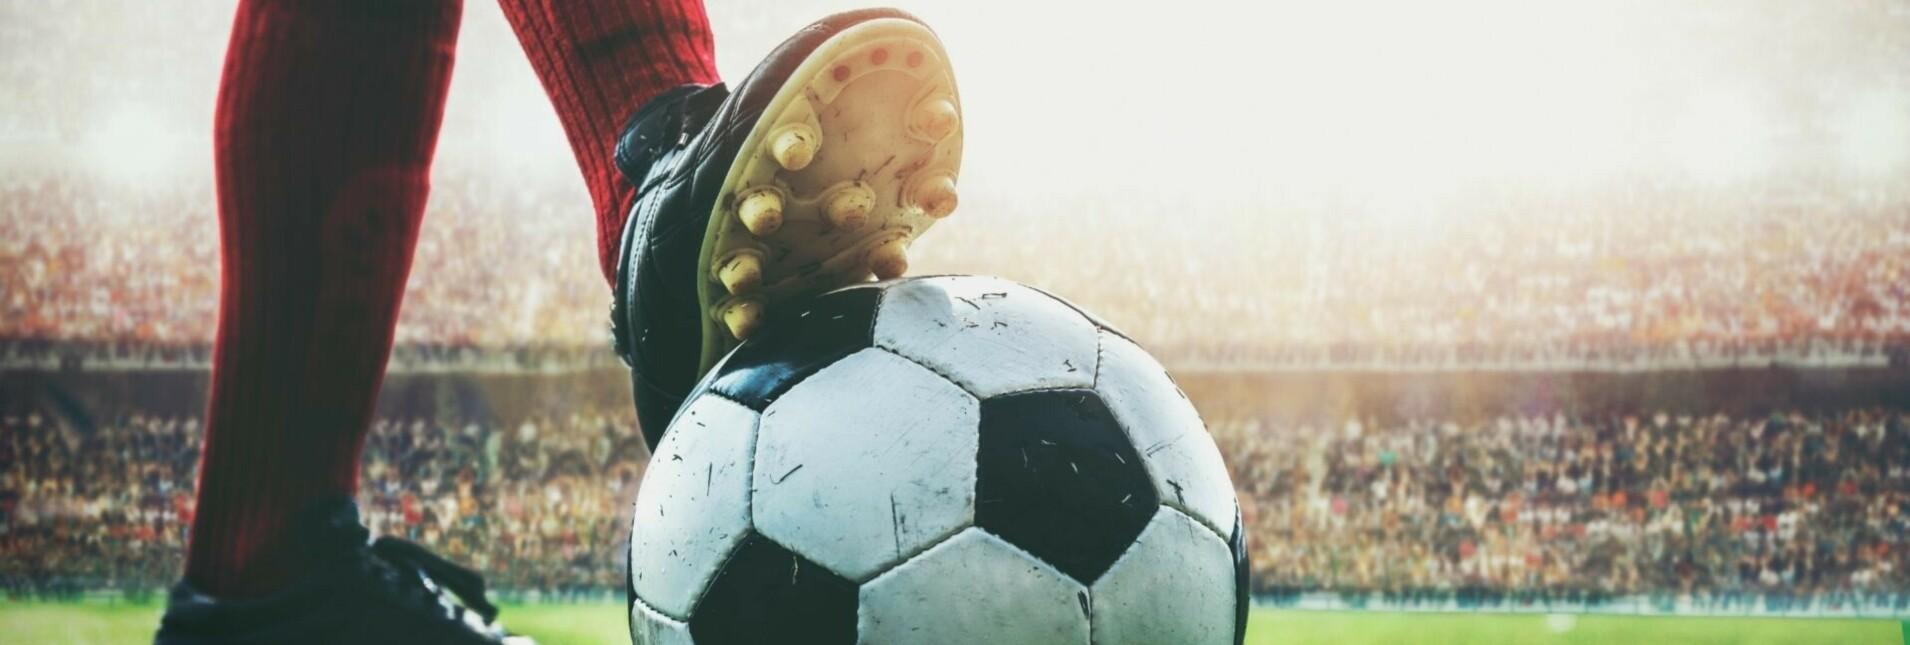 4* Tryp Atocha - Fußballreise Real Madrid